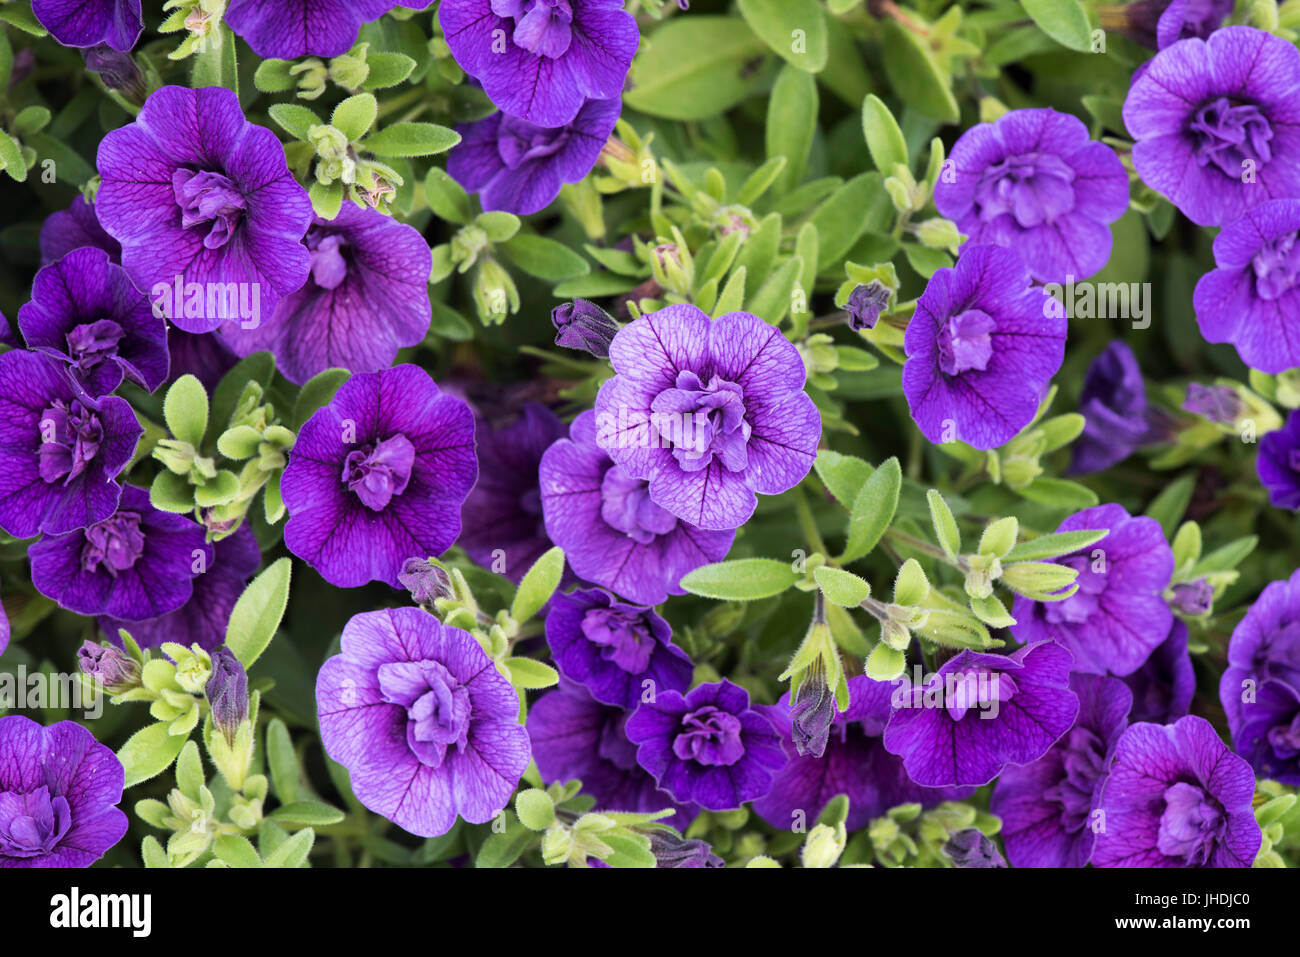 Calibrachoa caloha 'Double blue'. Mini Petunia flowers in hanging baskets. UK - Stock Image